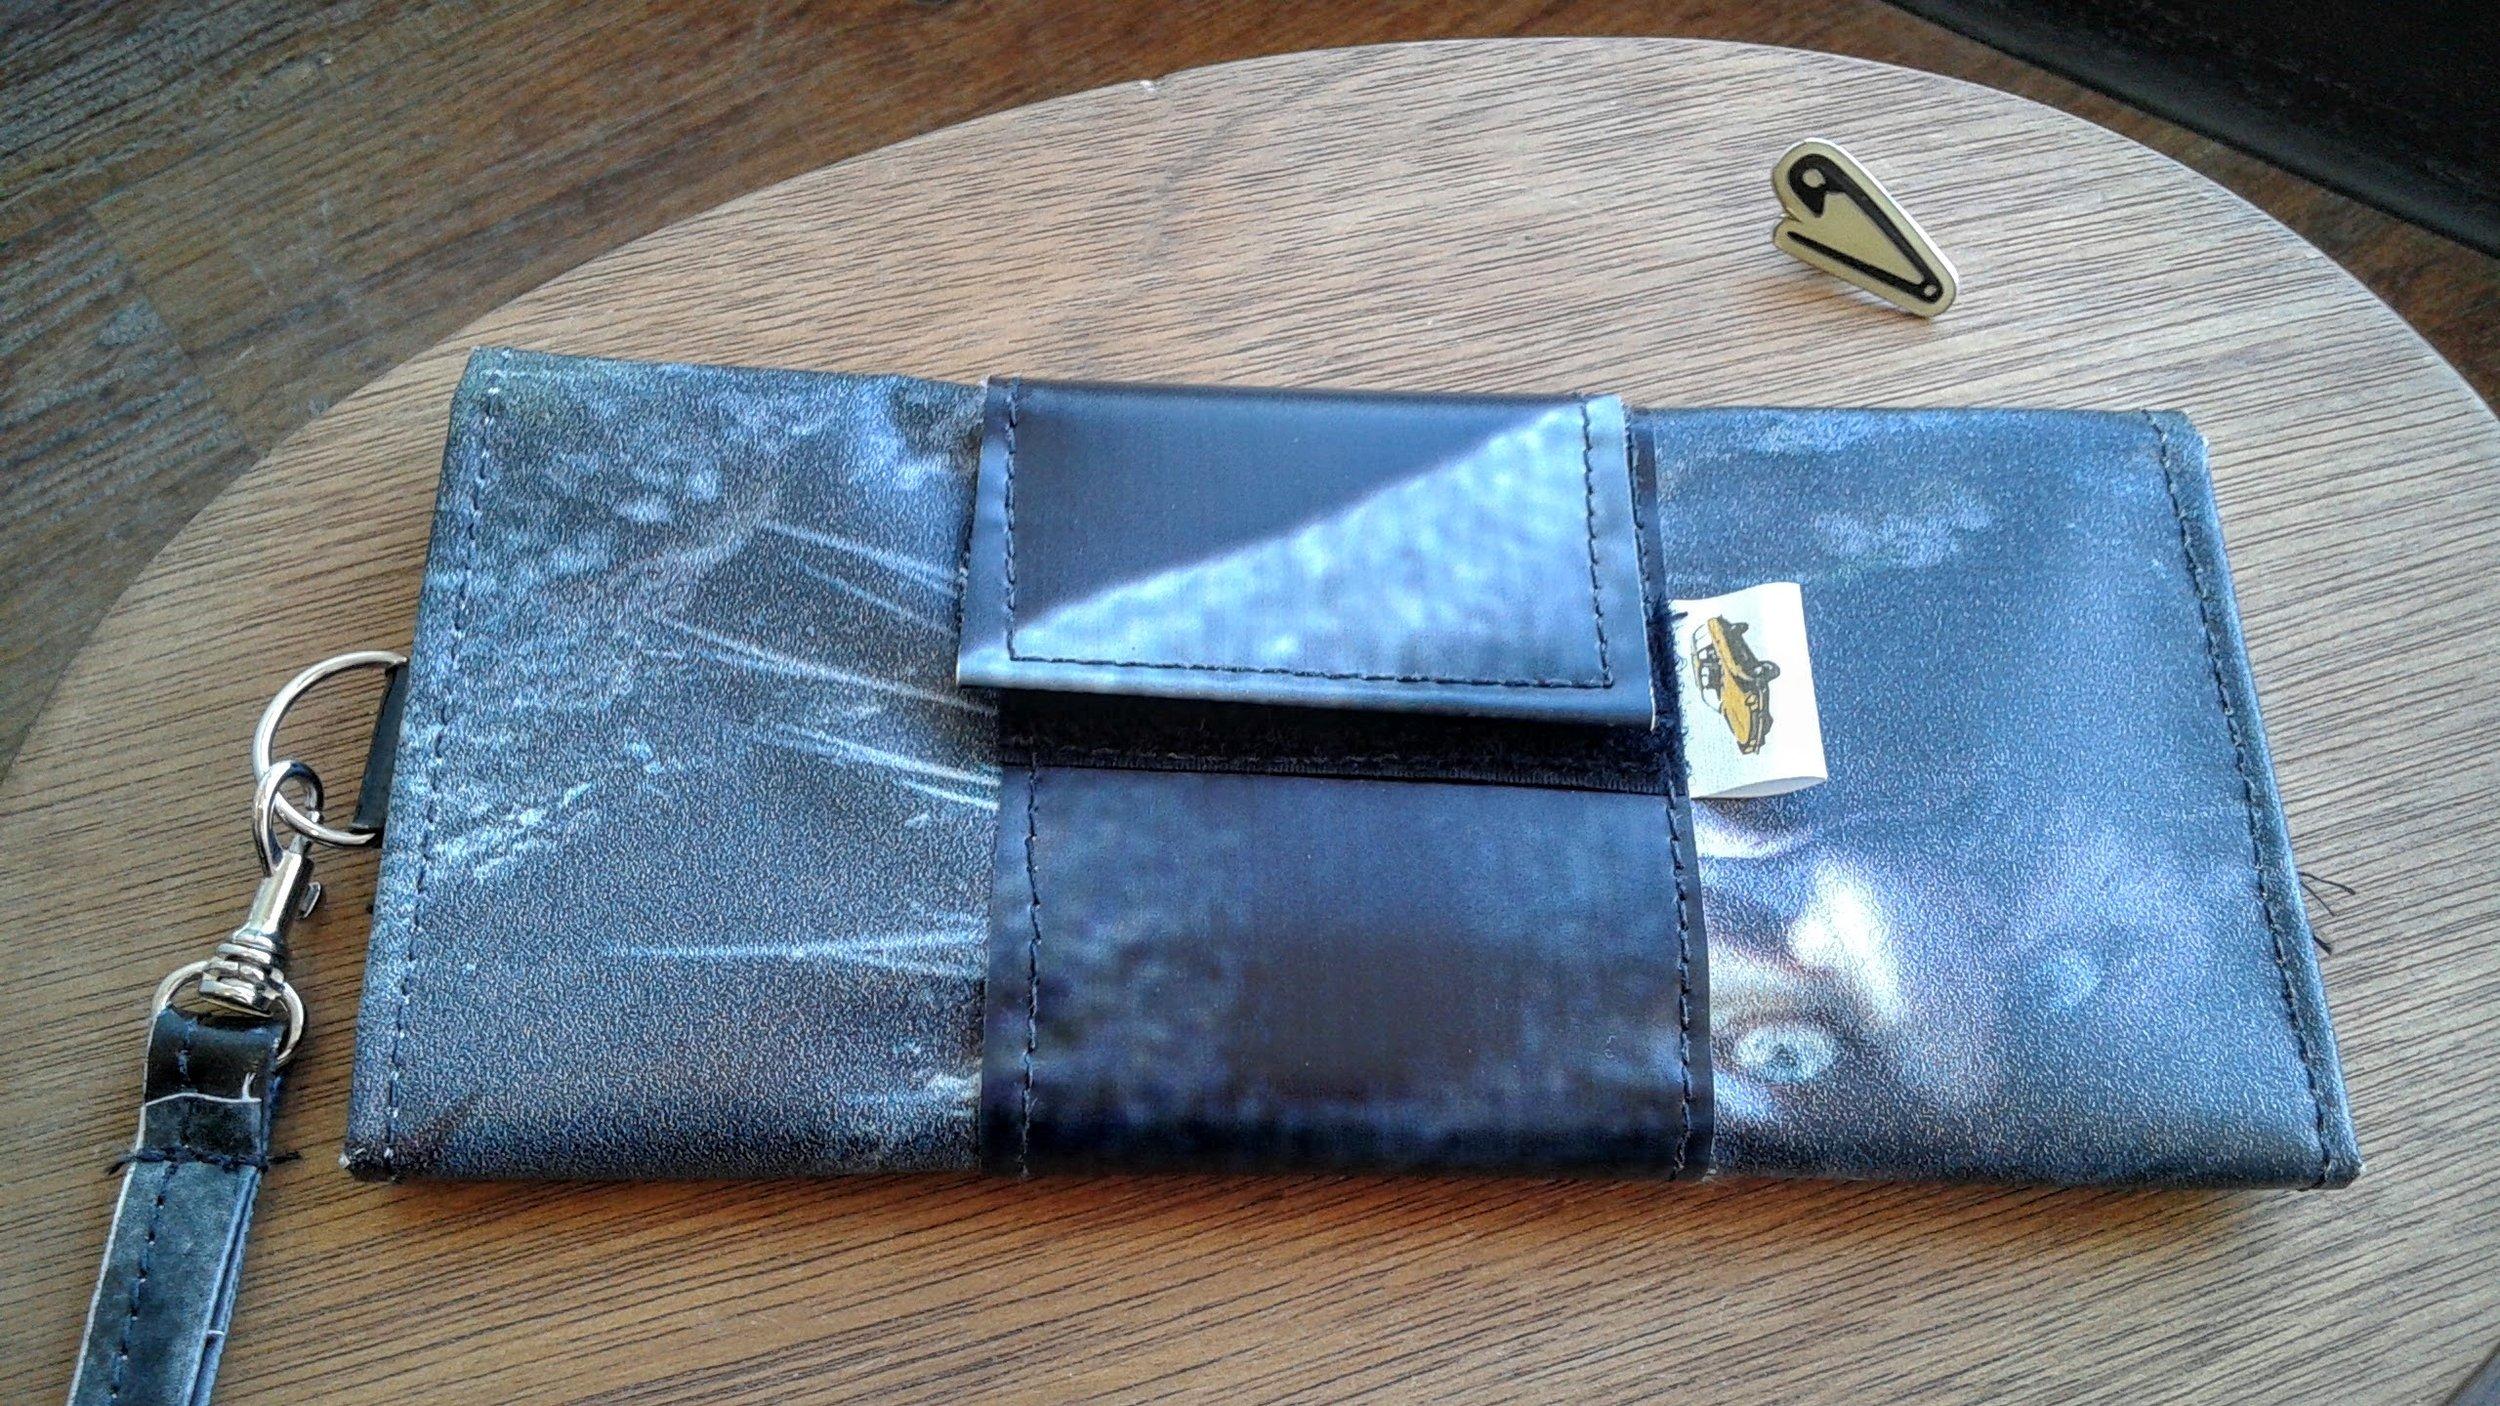 Pinto Bags wallet, $16; Saftey pin pin, $7